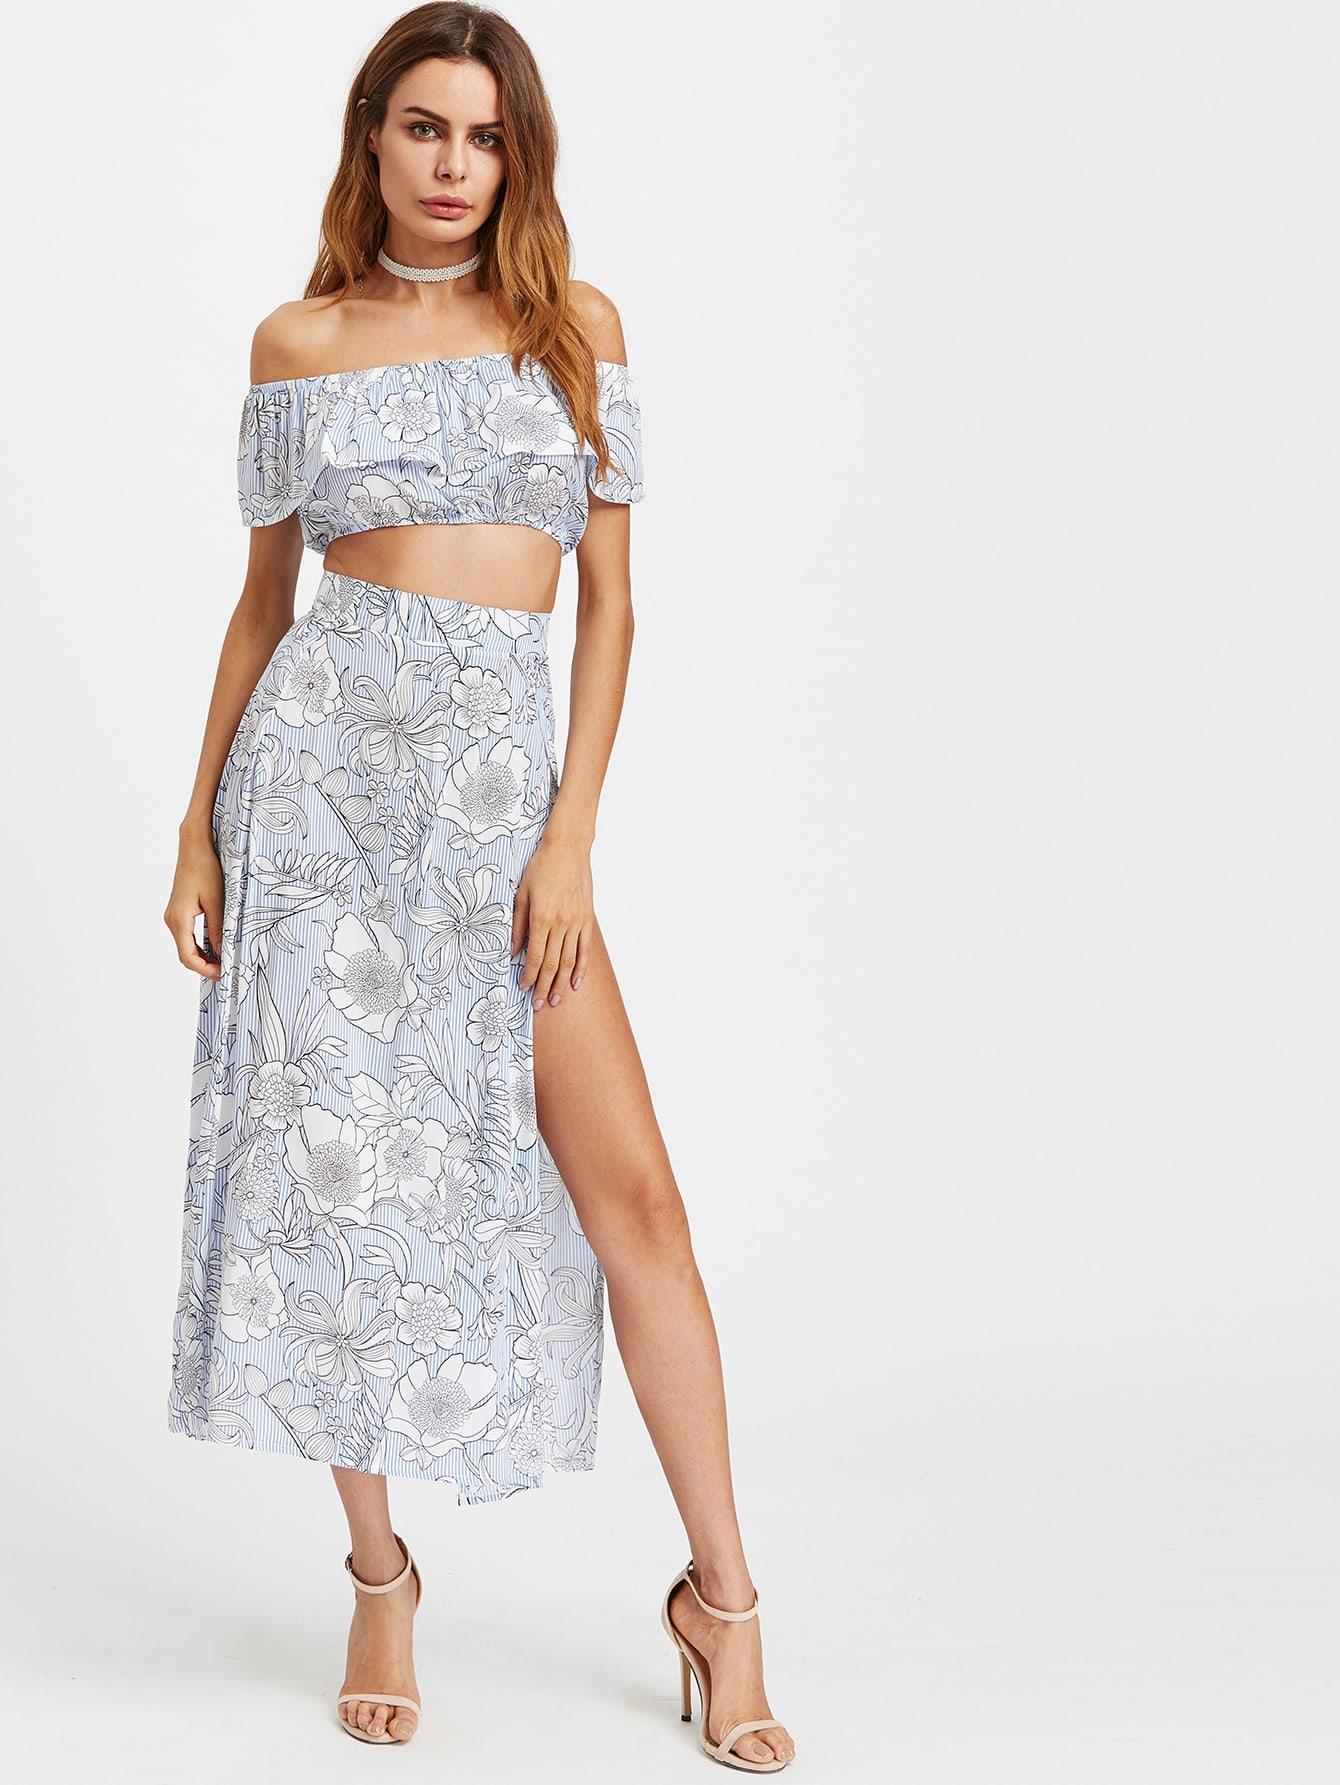 Bardot Floral Print Crop Top With Slit Side Skirt bardot embroidered appliques crop top